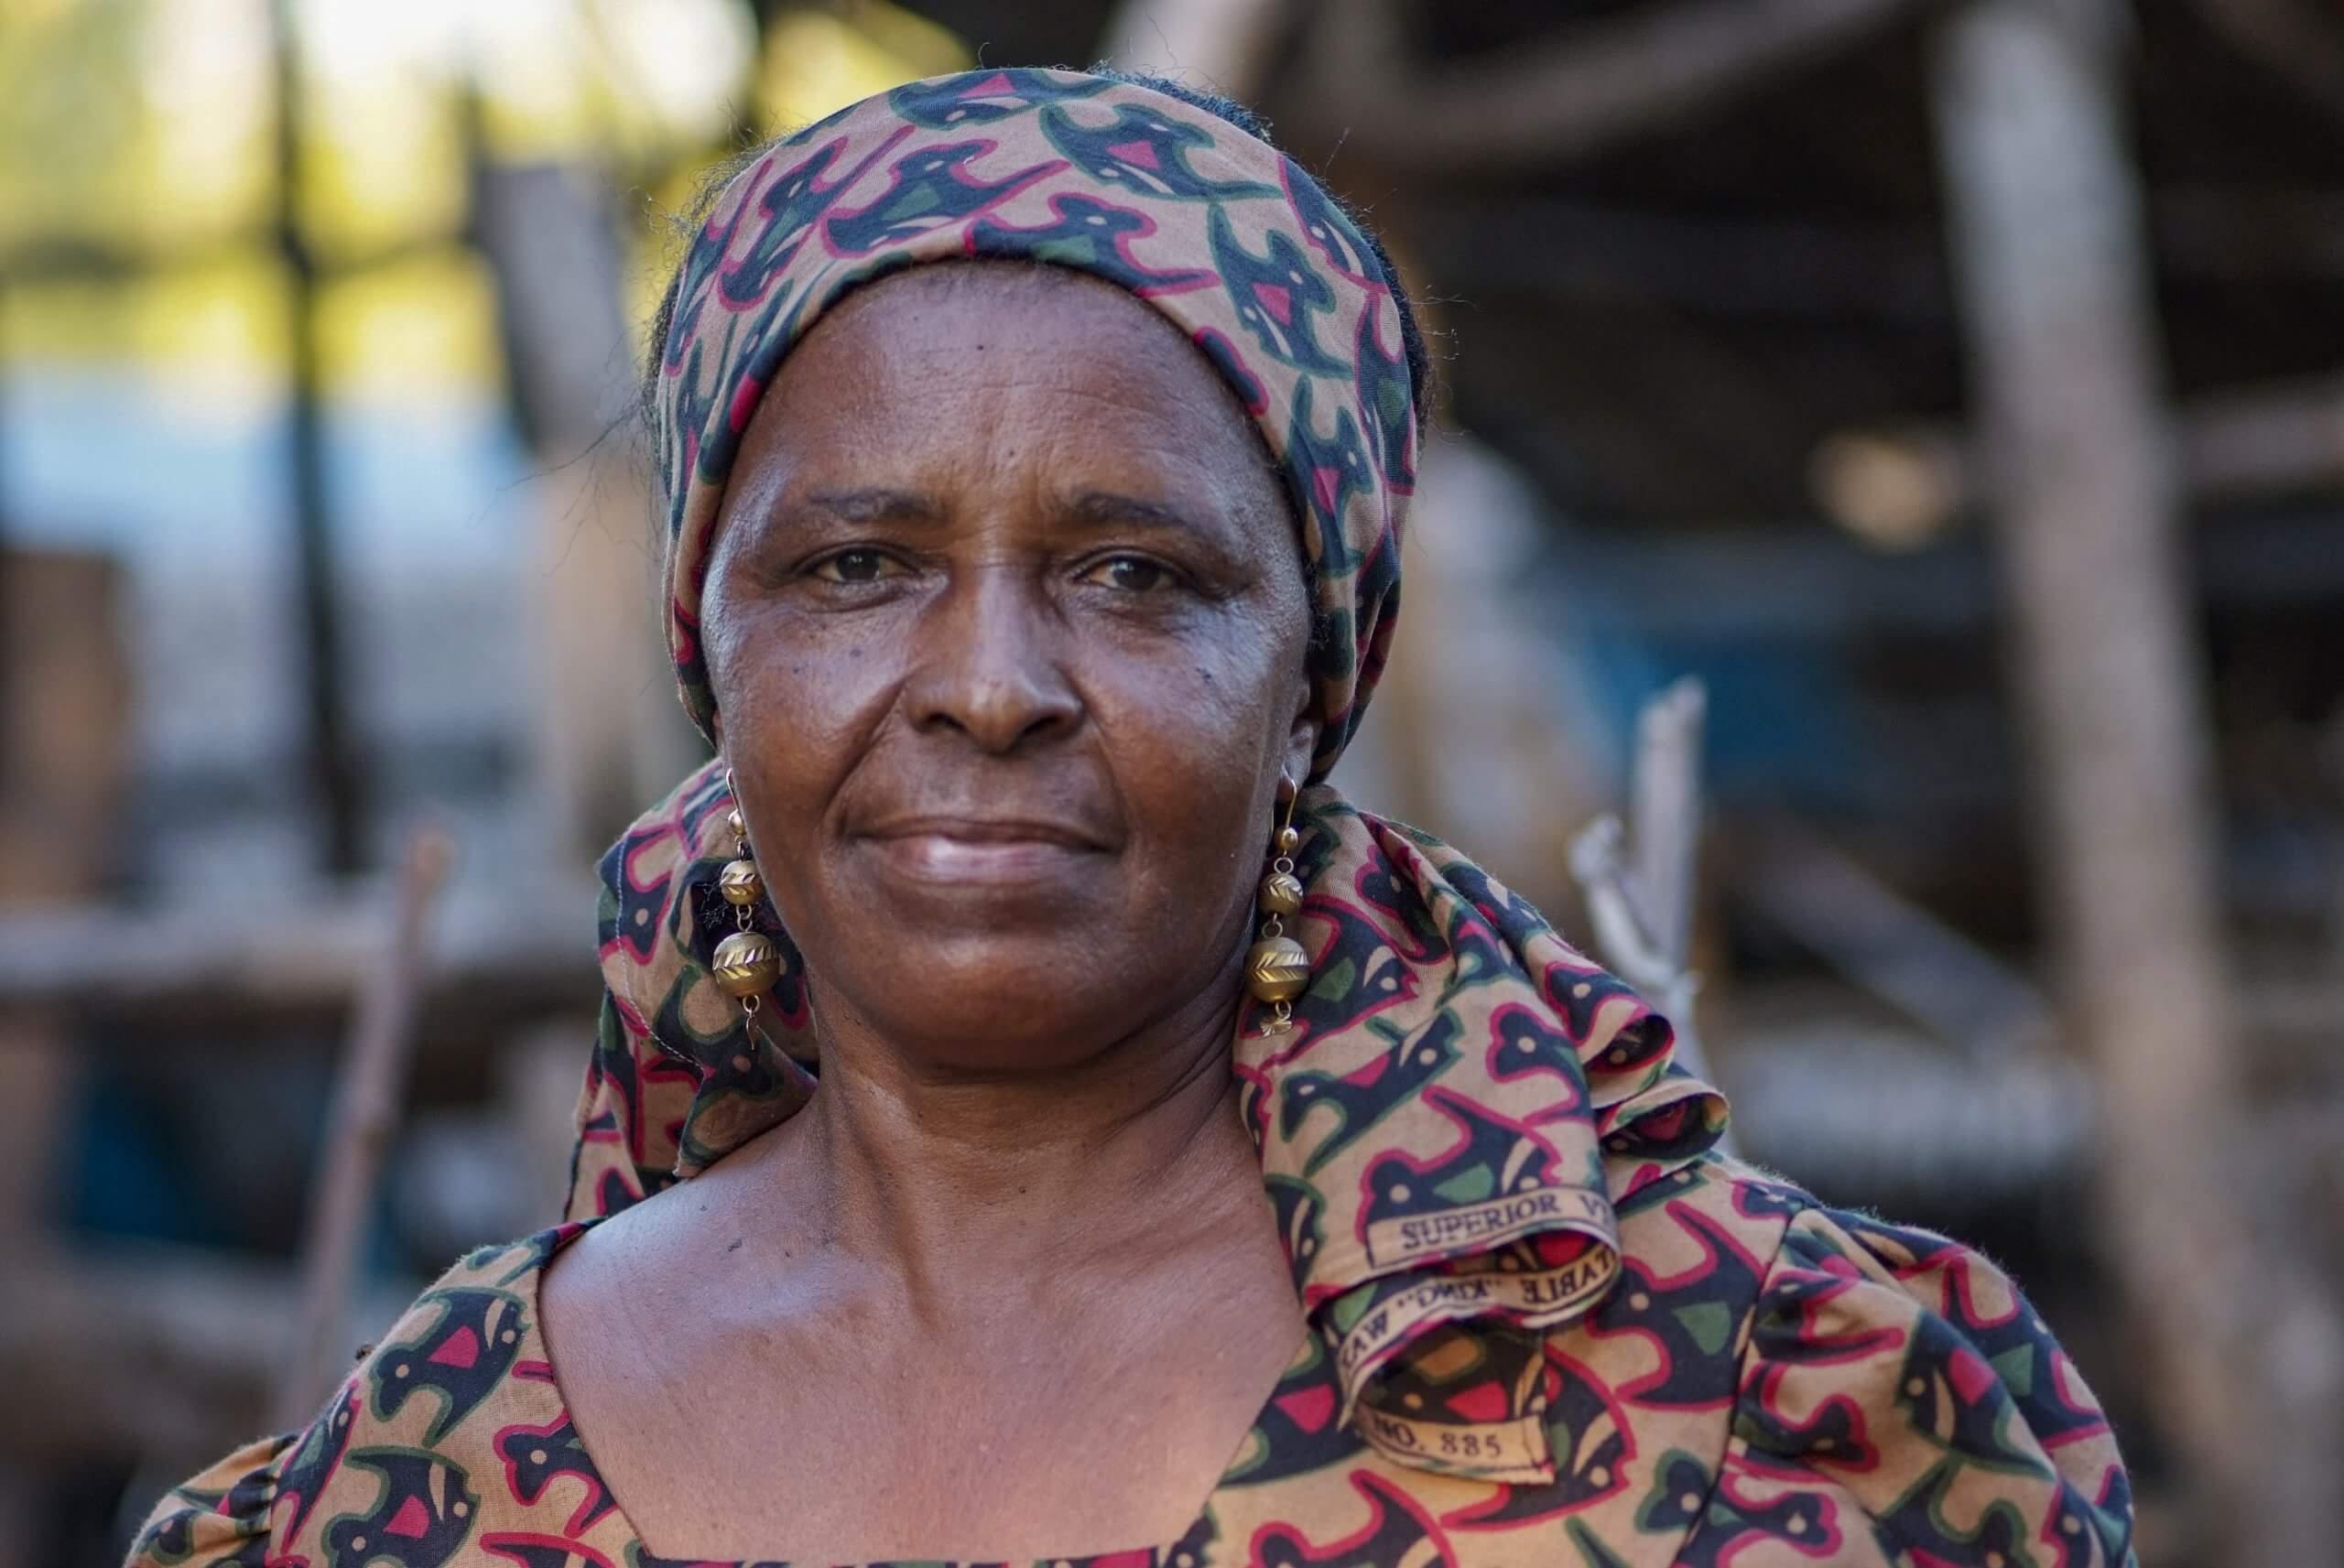 12 boerin trotsevrouw Rose J Mnyikas TAnga Tanzania 4122 1 scaled